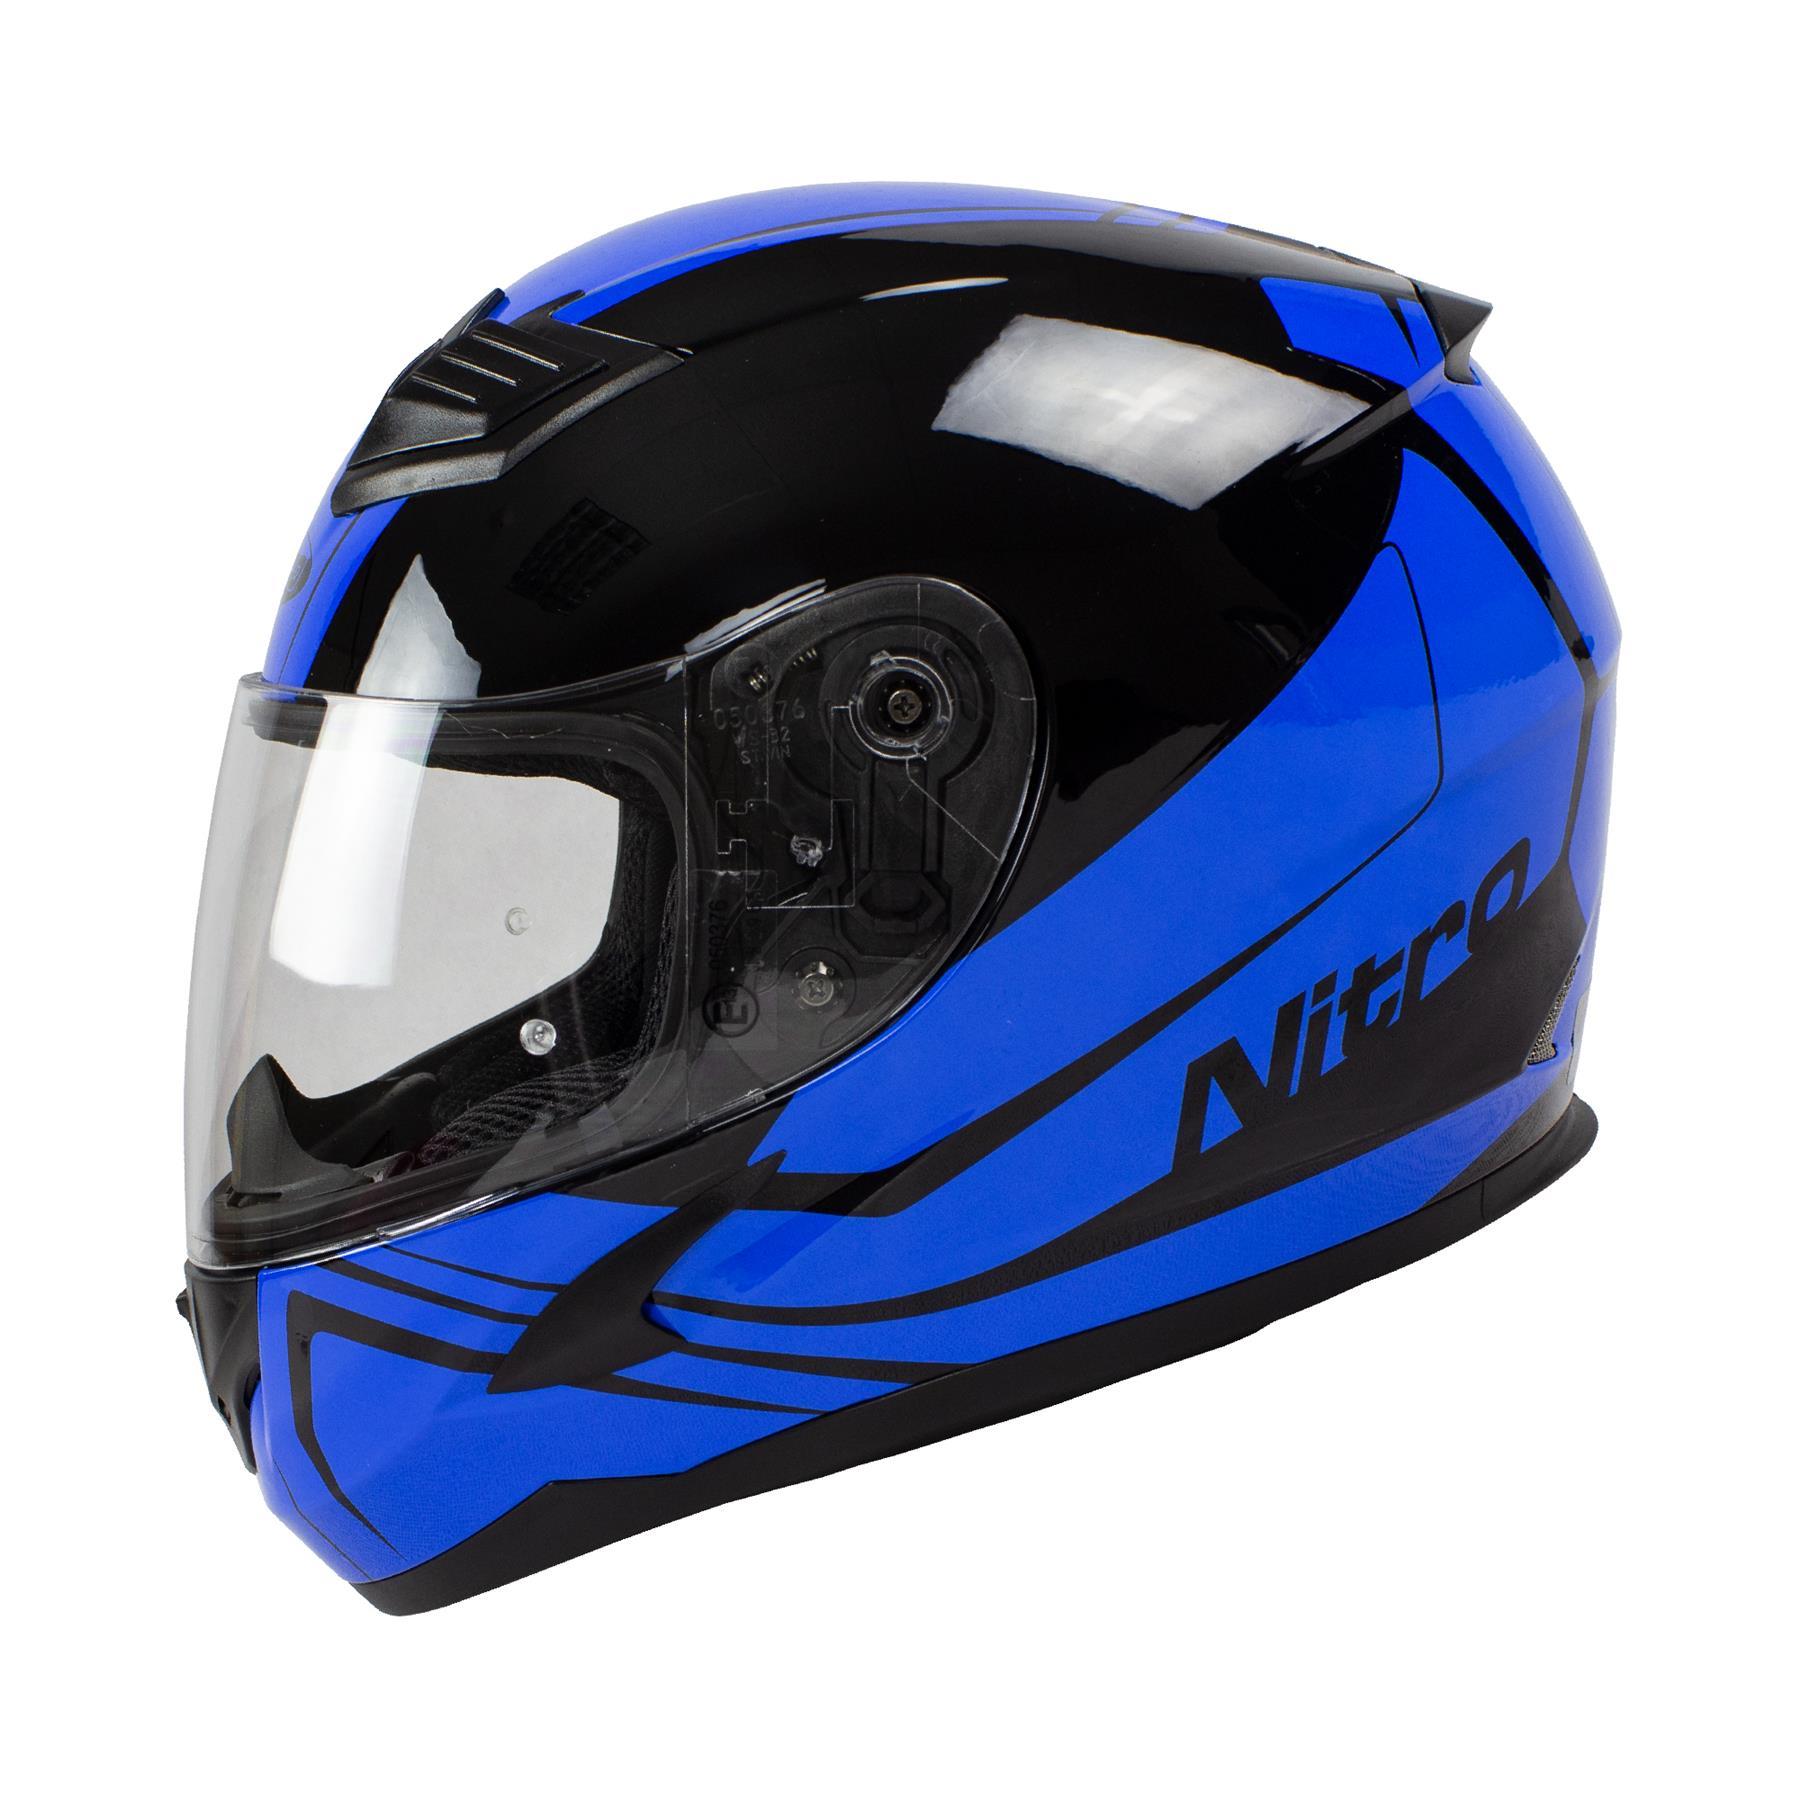 Nitro-N2400-Rogue-Full-Face-Motorcycle-Motorbike-Crash-Helmet-Black-Blue-Red thumbnail 14